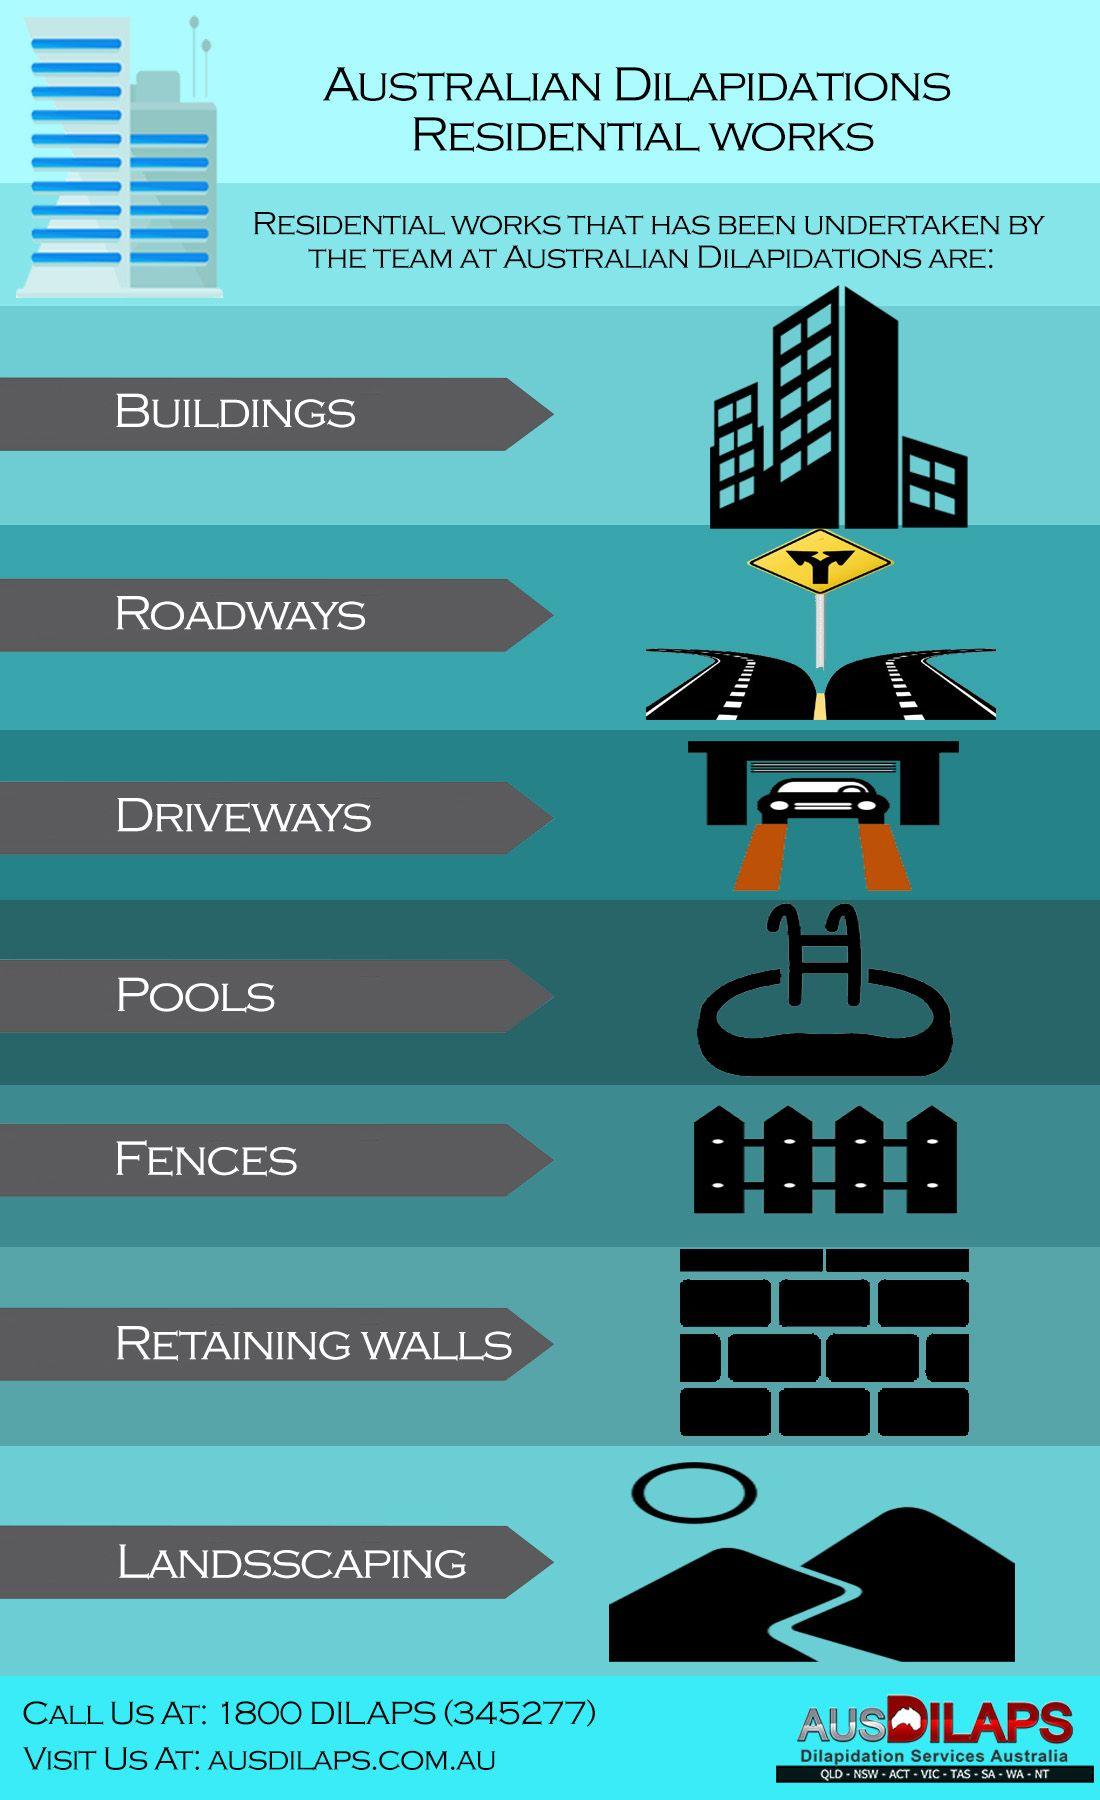 Australian Dilapidations Residential Works Residential